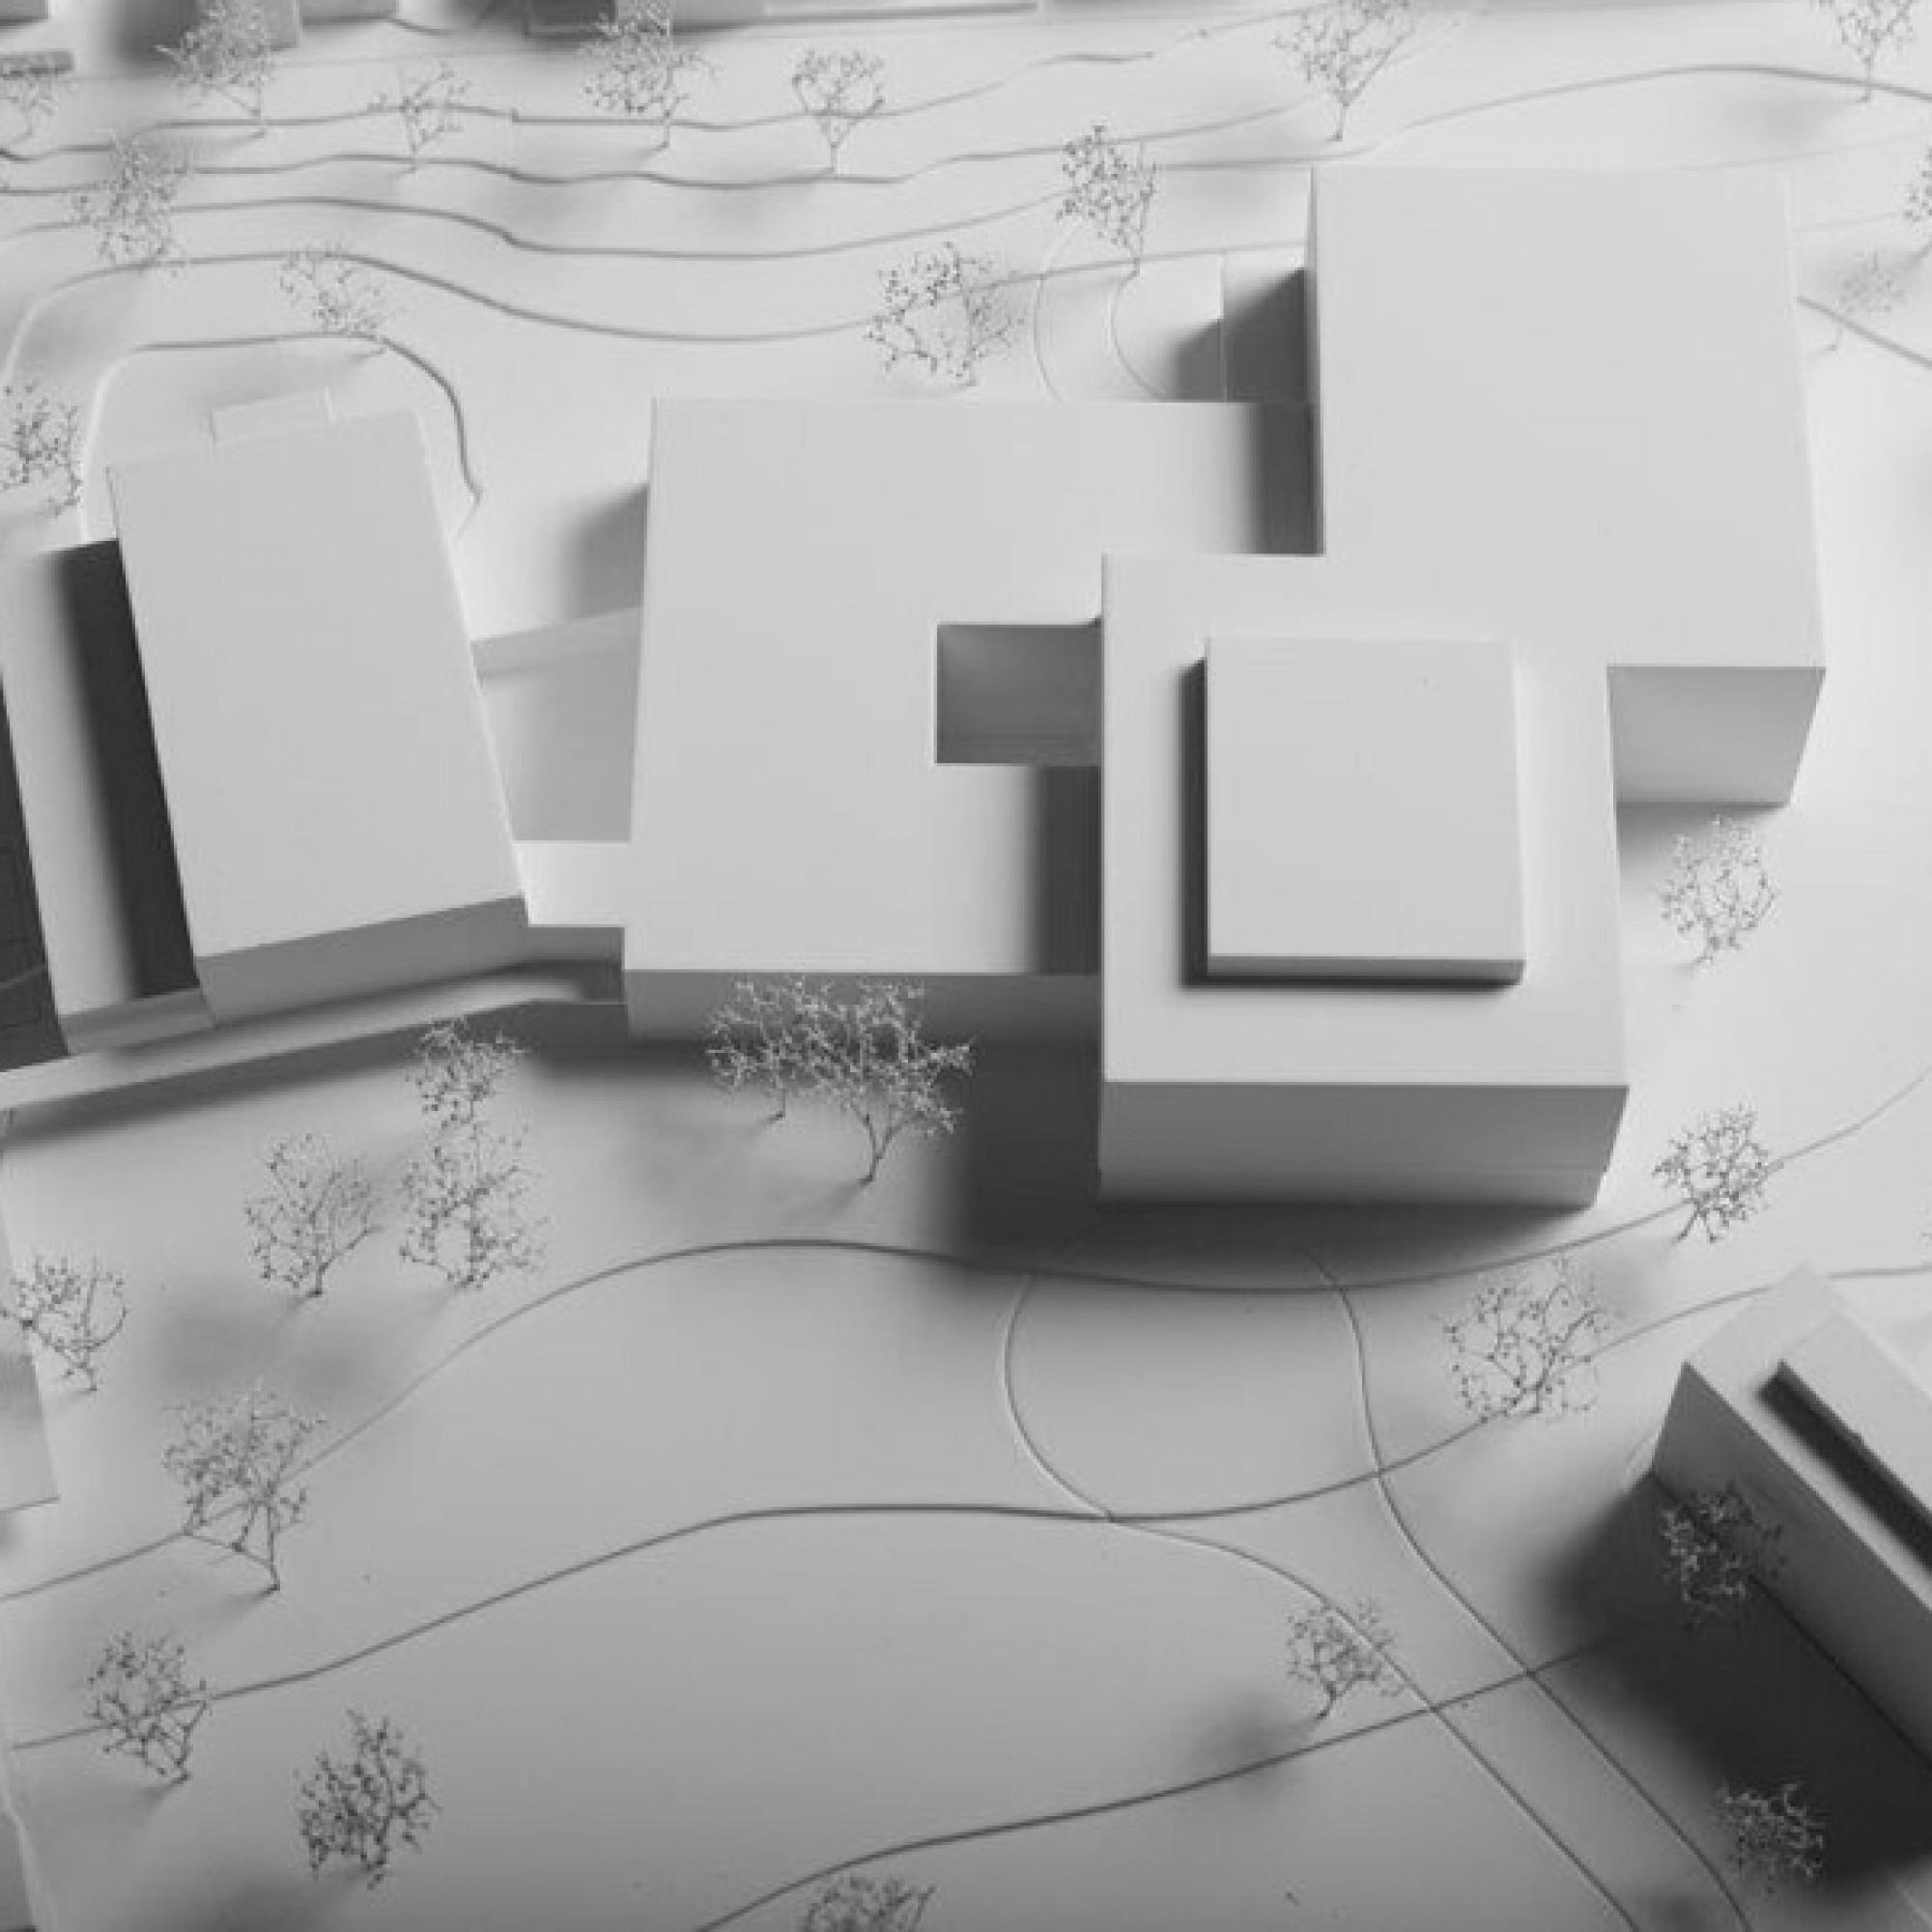 Modell des neuen Kantonsspitals Uri